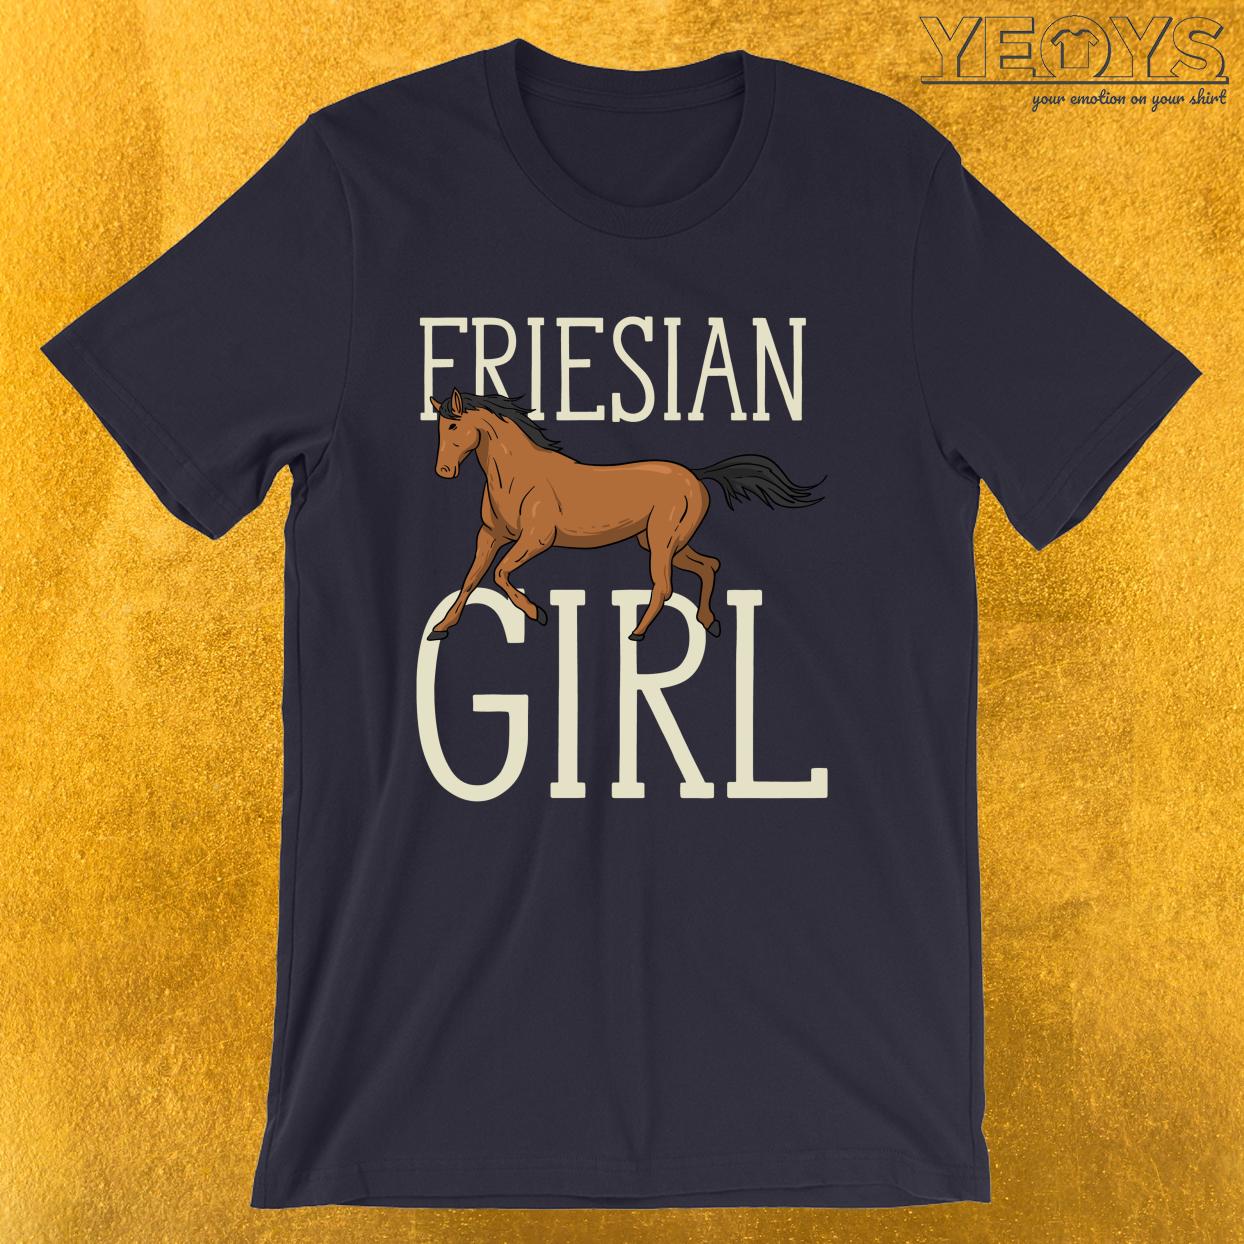 Friesian Girl – Horse Girl Tee